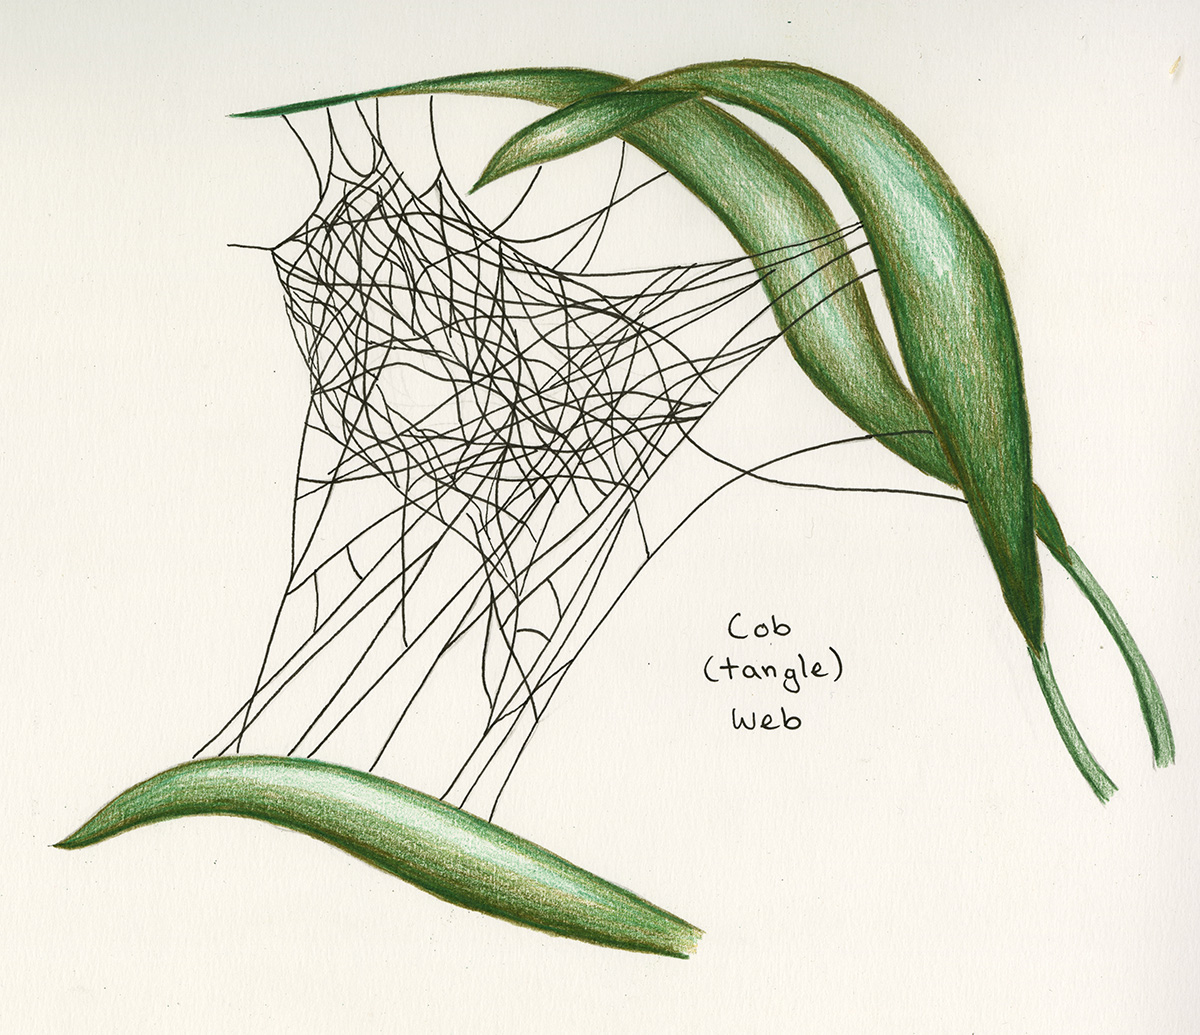 cob-tangle web